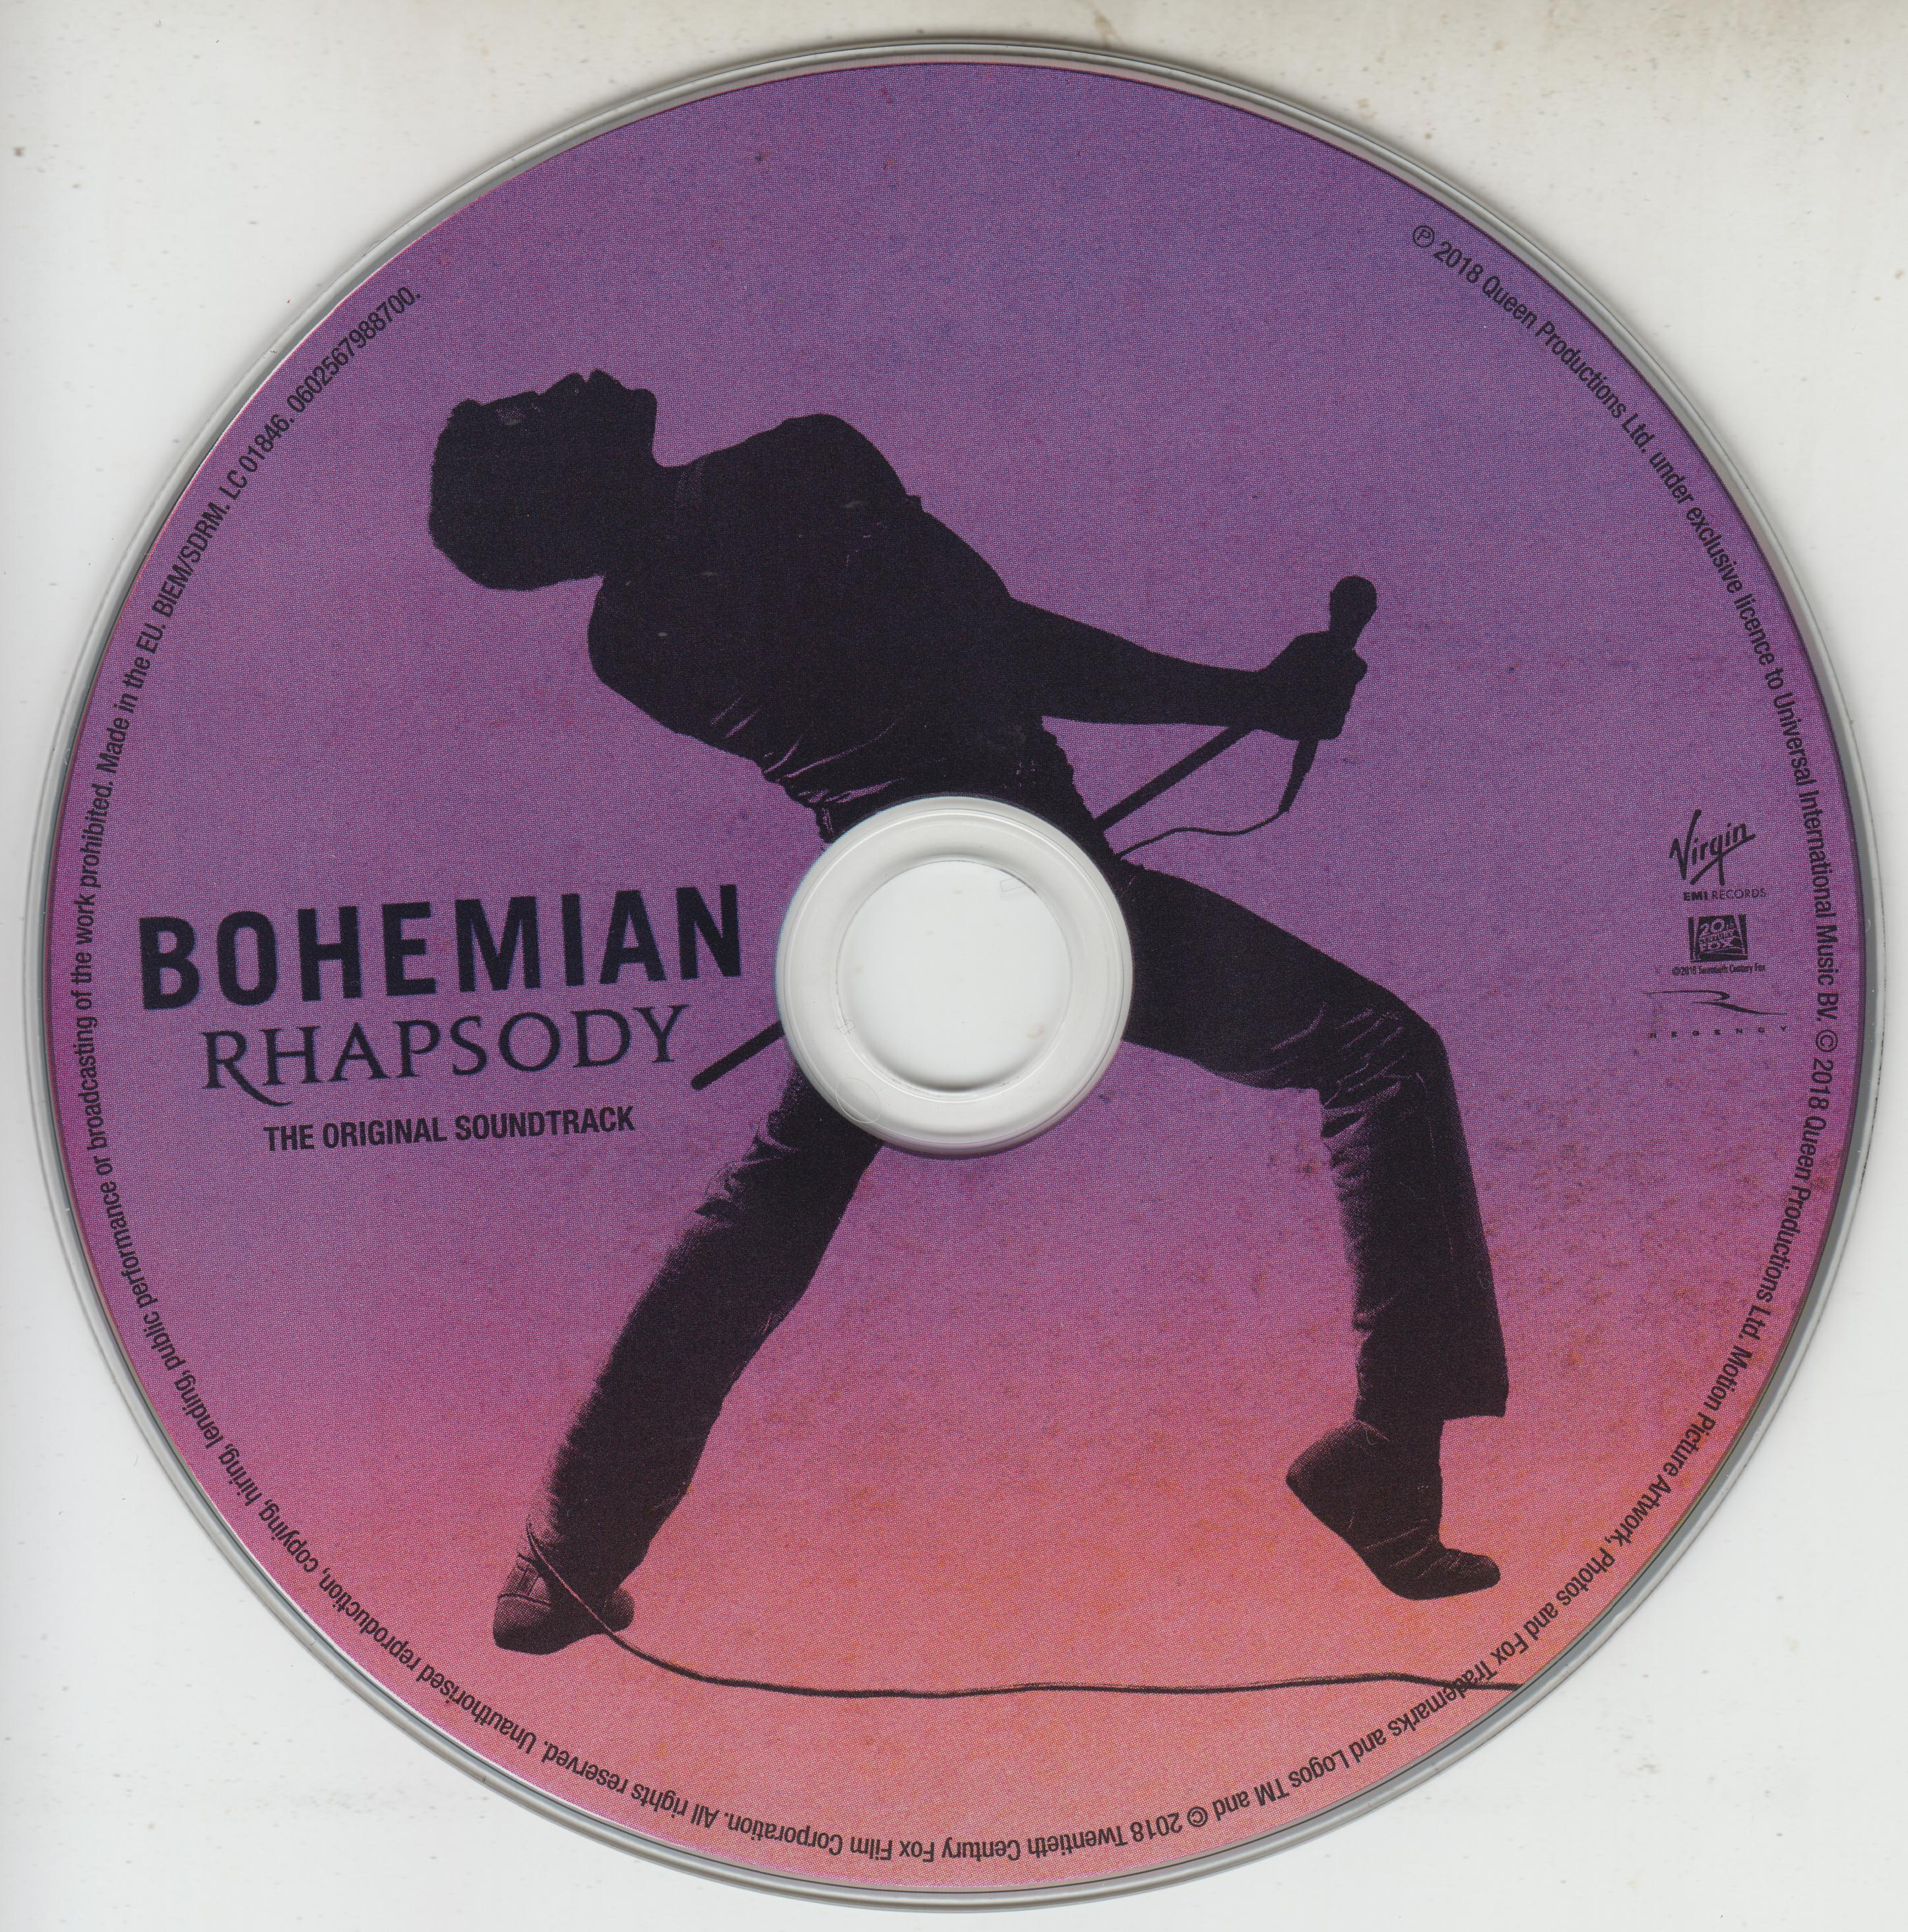 Coversboxsk Queen Bohemian Rhapsody The Original Soundtrack